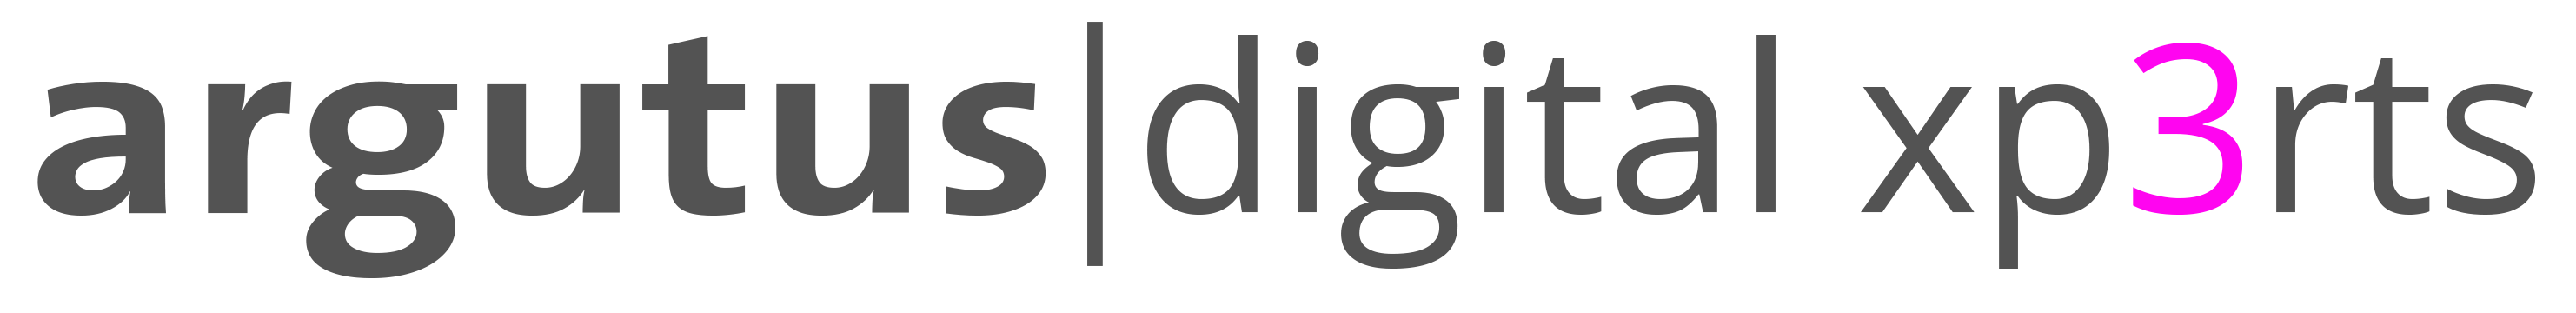 argutus-digitalxperts